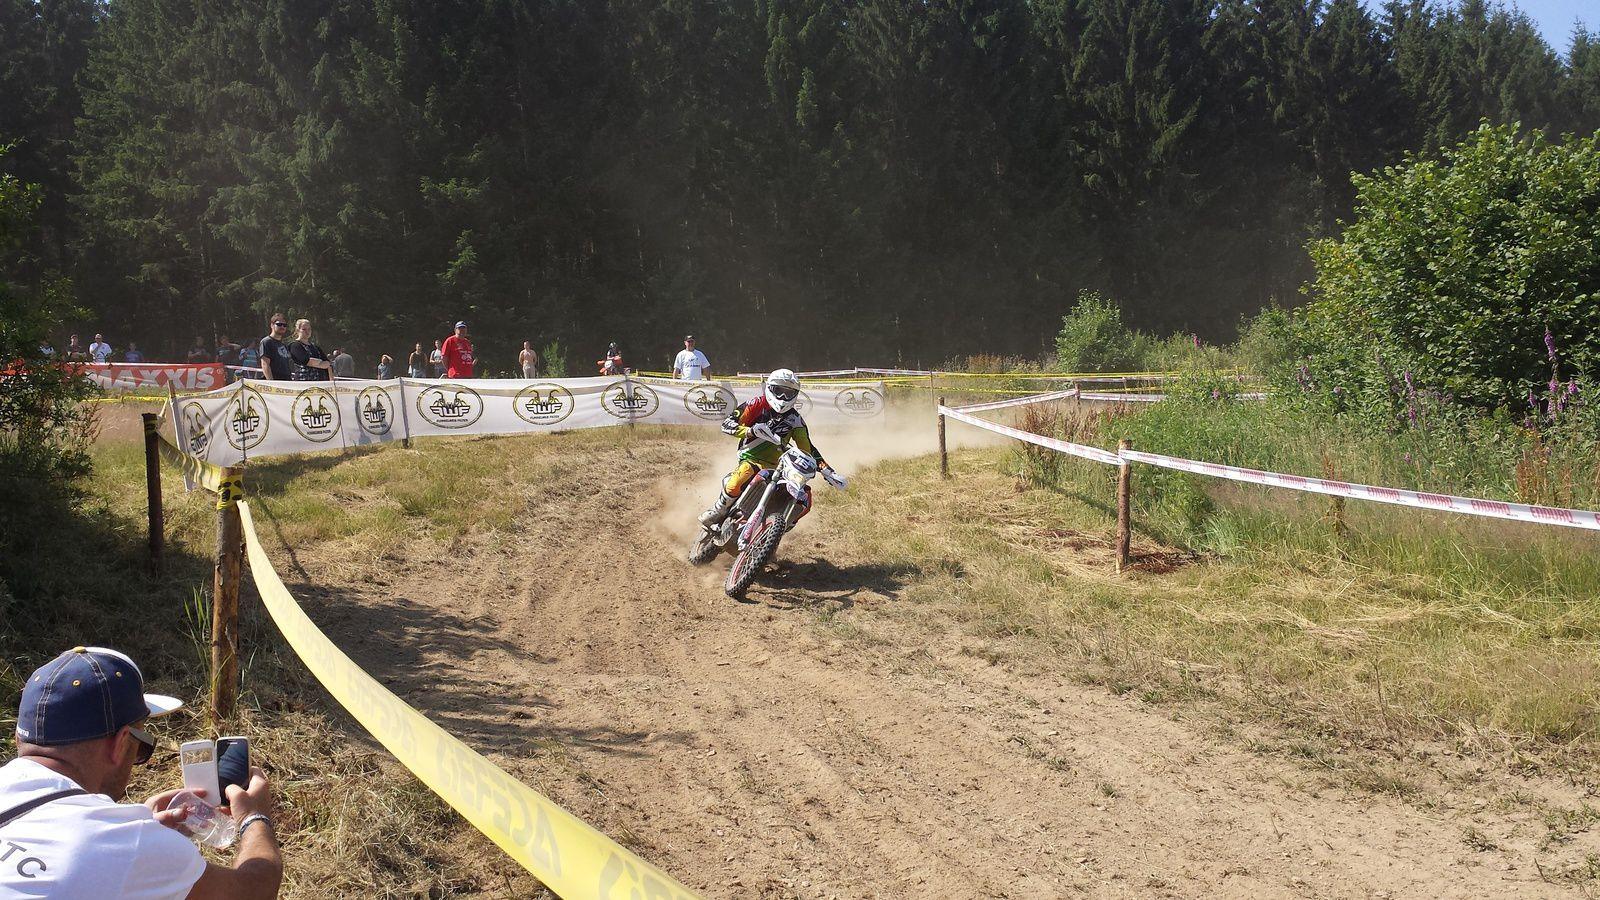 Charles DEGAND au Championnat du Monde d'Enduro à Saint-Hubert